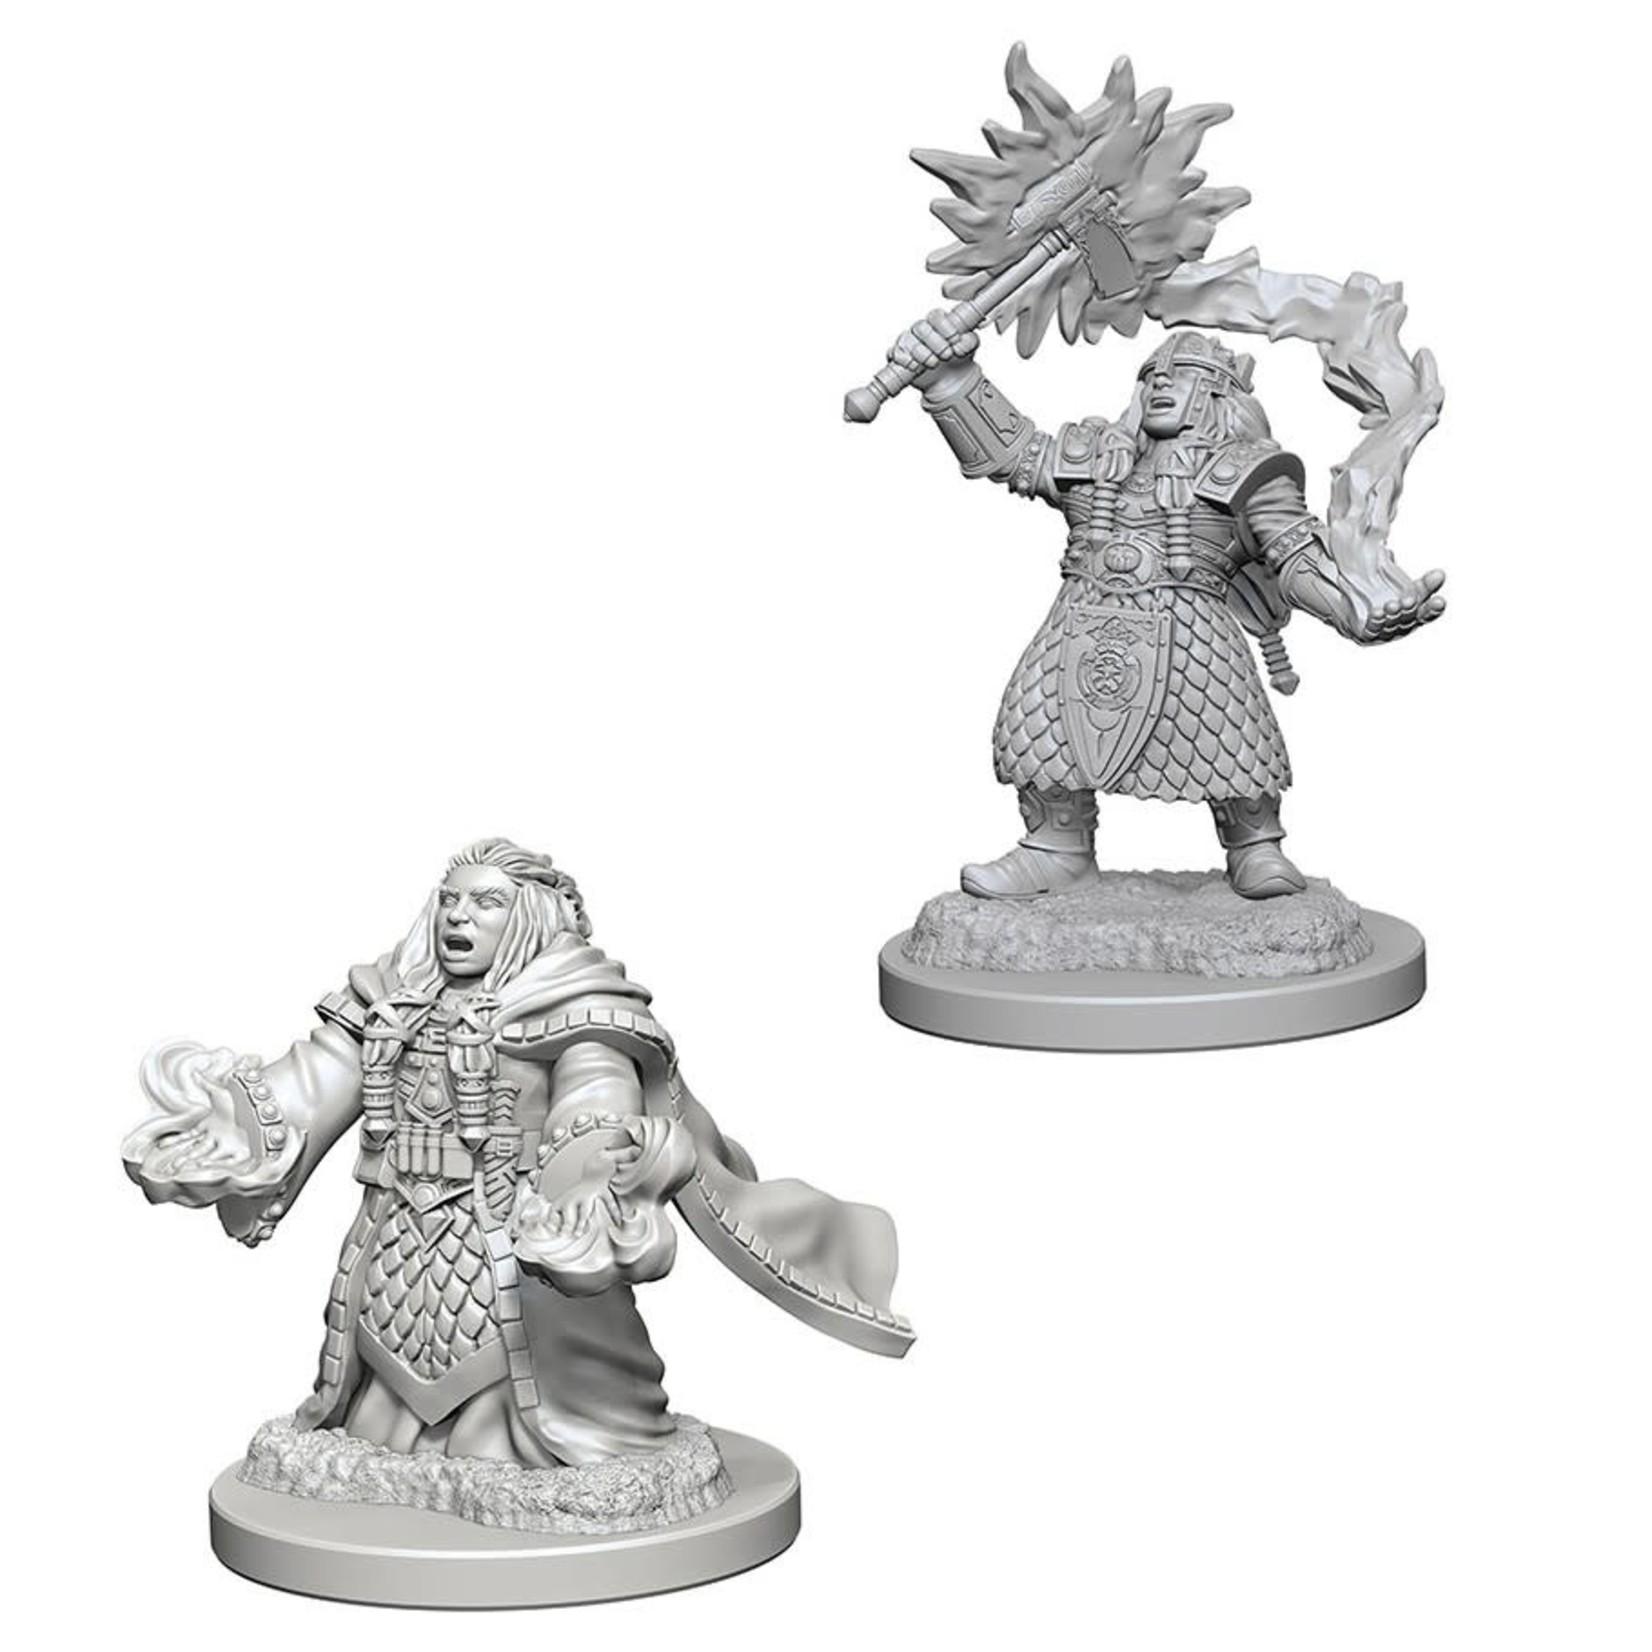 WizKids/Neca 72625 Nolzur's Dwarf Female Cleric